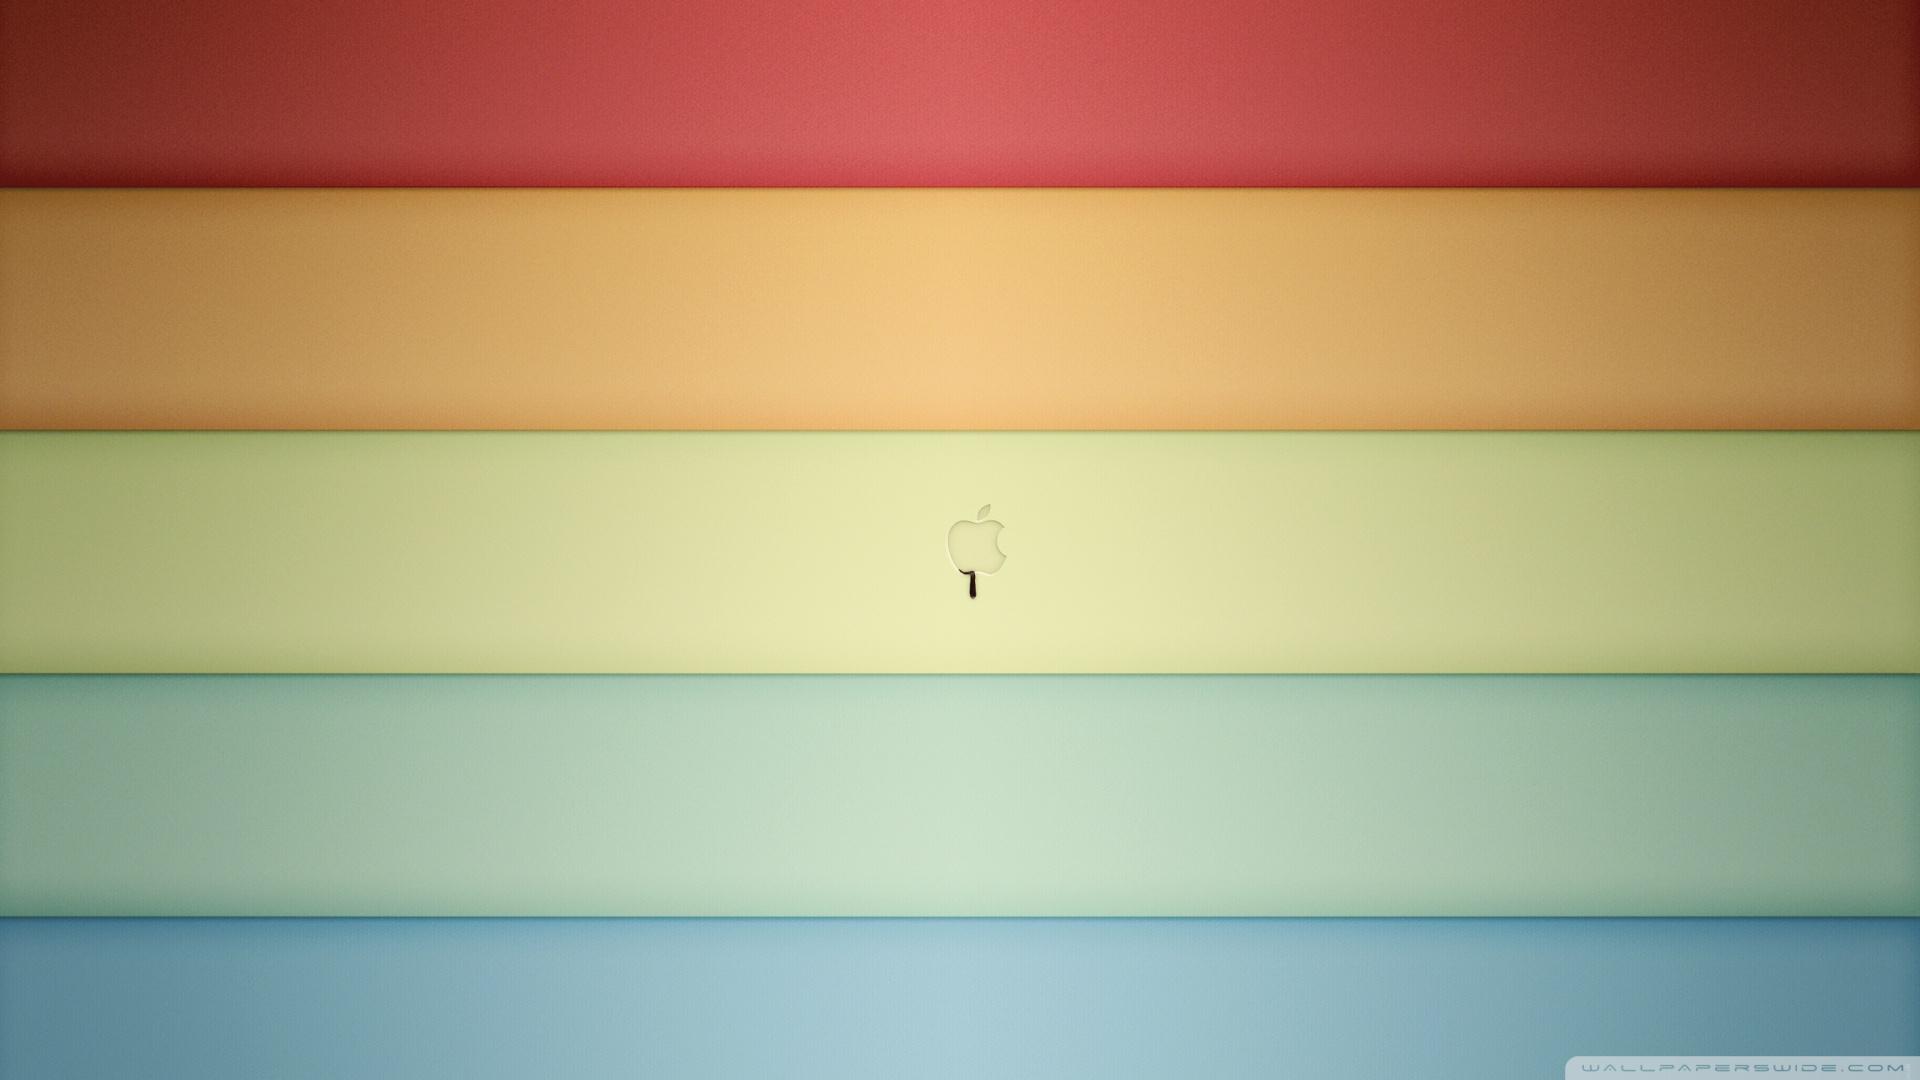 Plain colorful wallpaper - SF Wallpaper